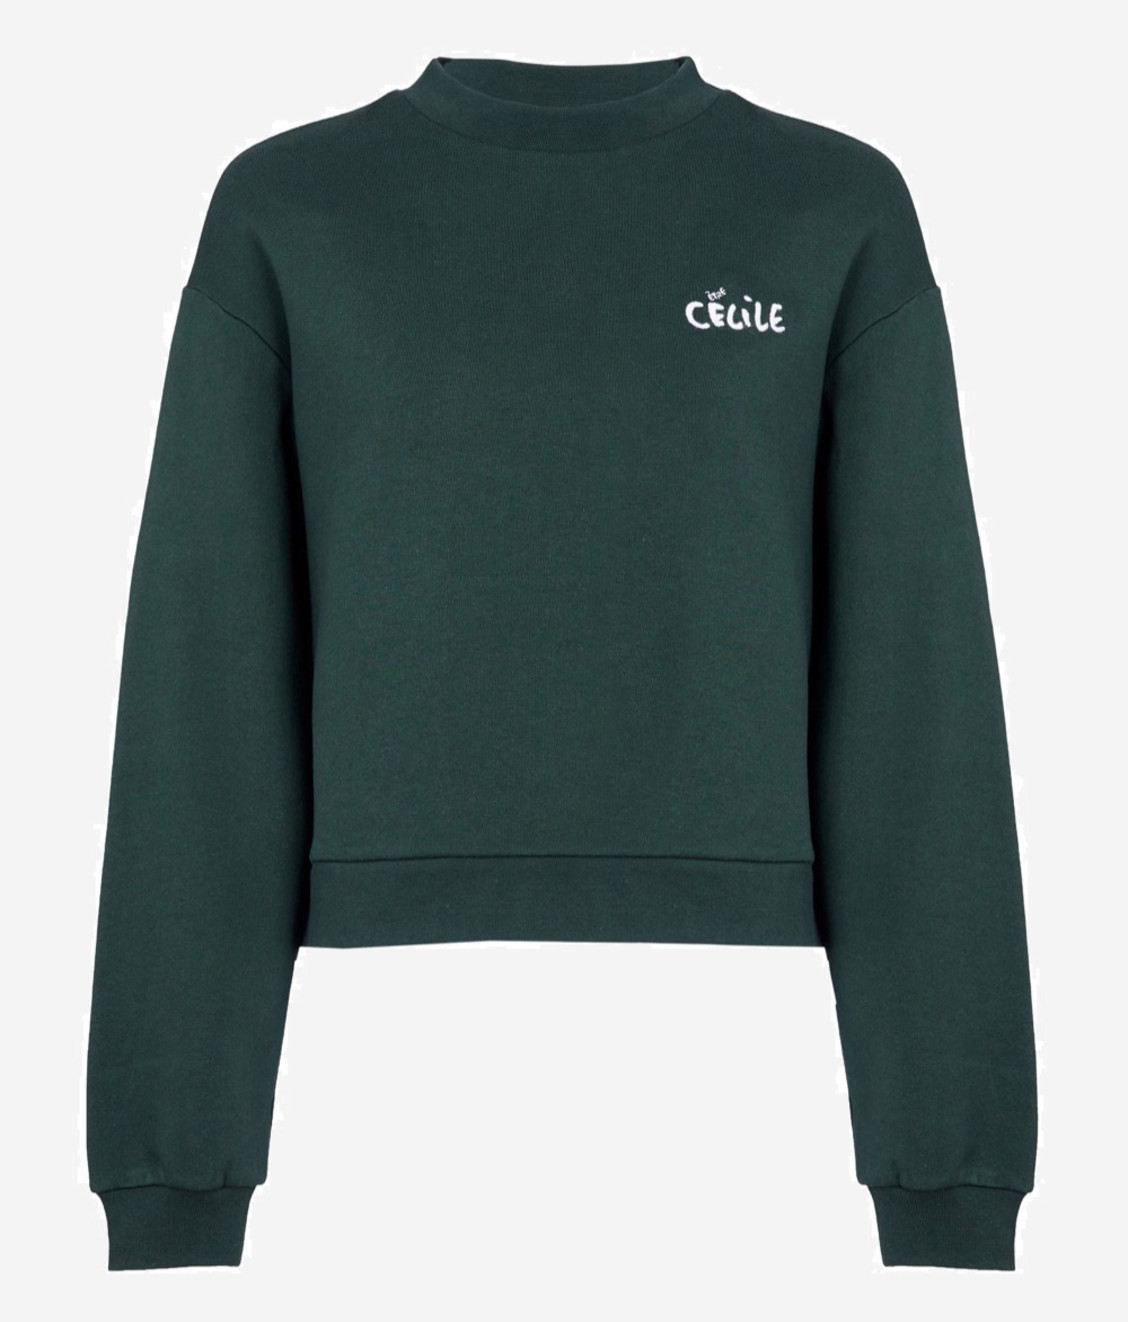 Etre Cecile Cateyes Alexis Sweatshirt Deep Green